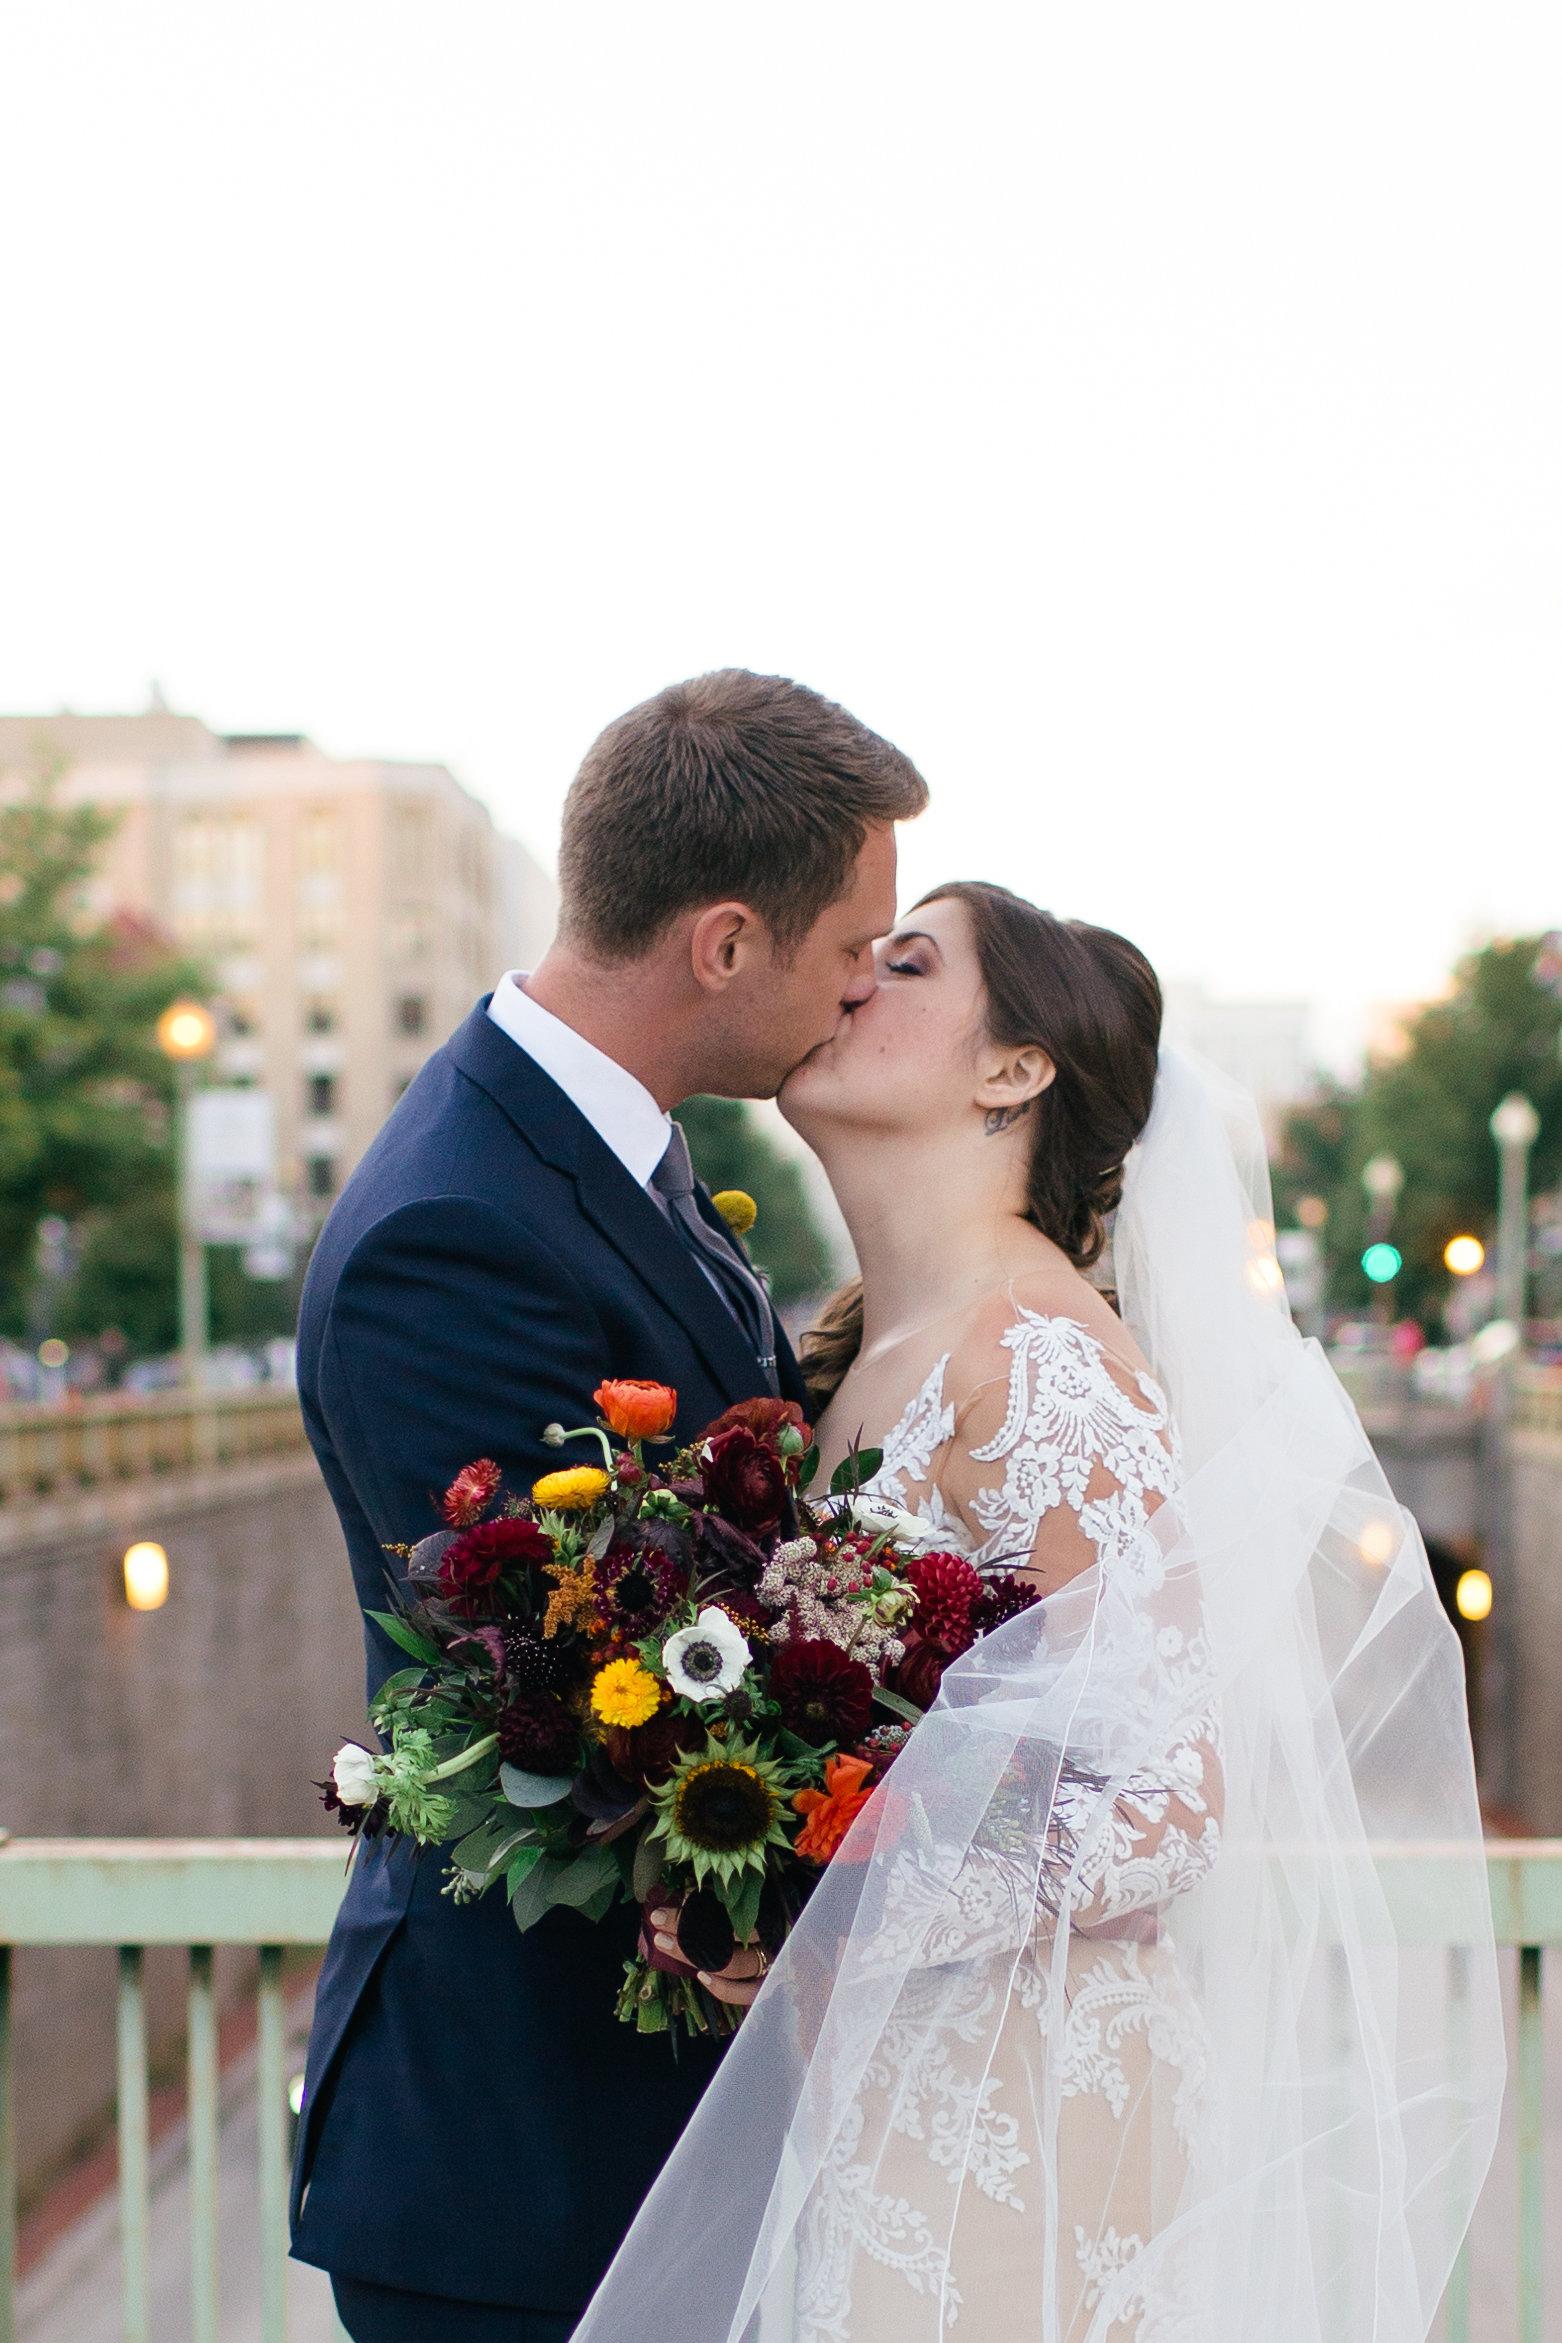 Dupon Circle Wedding | Washington DC Wedding Photography | Rebecca Wilcher Photography -29.jpg